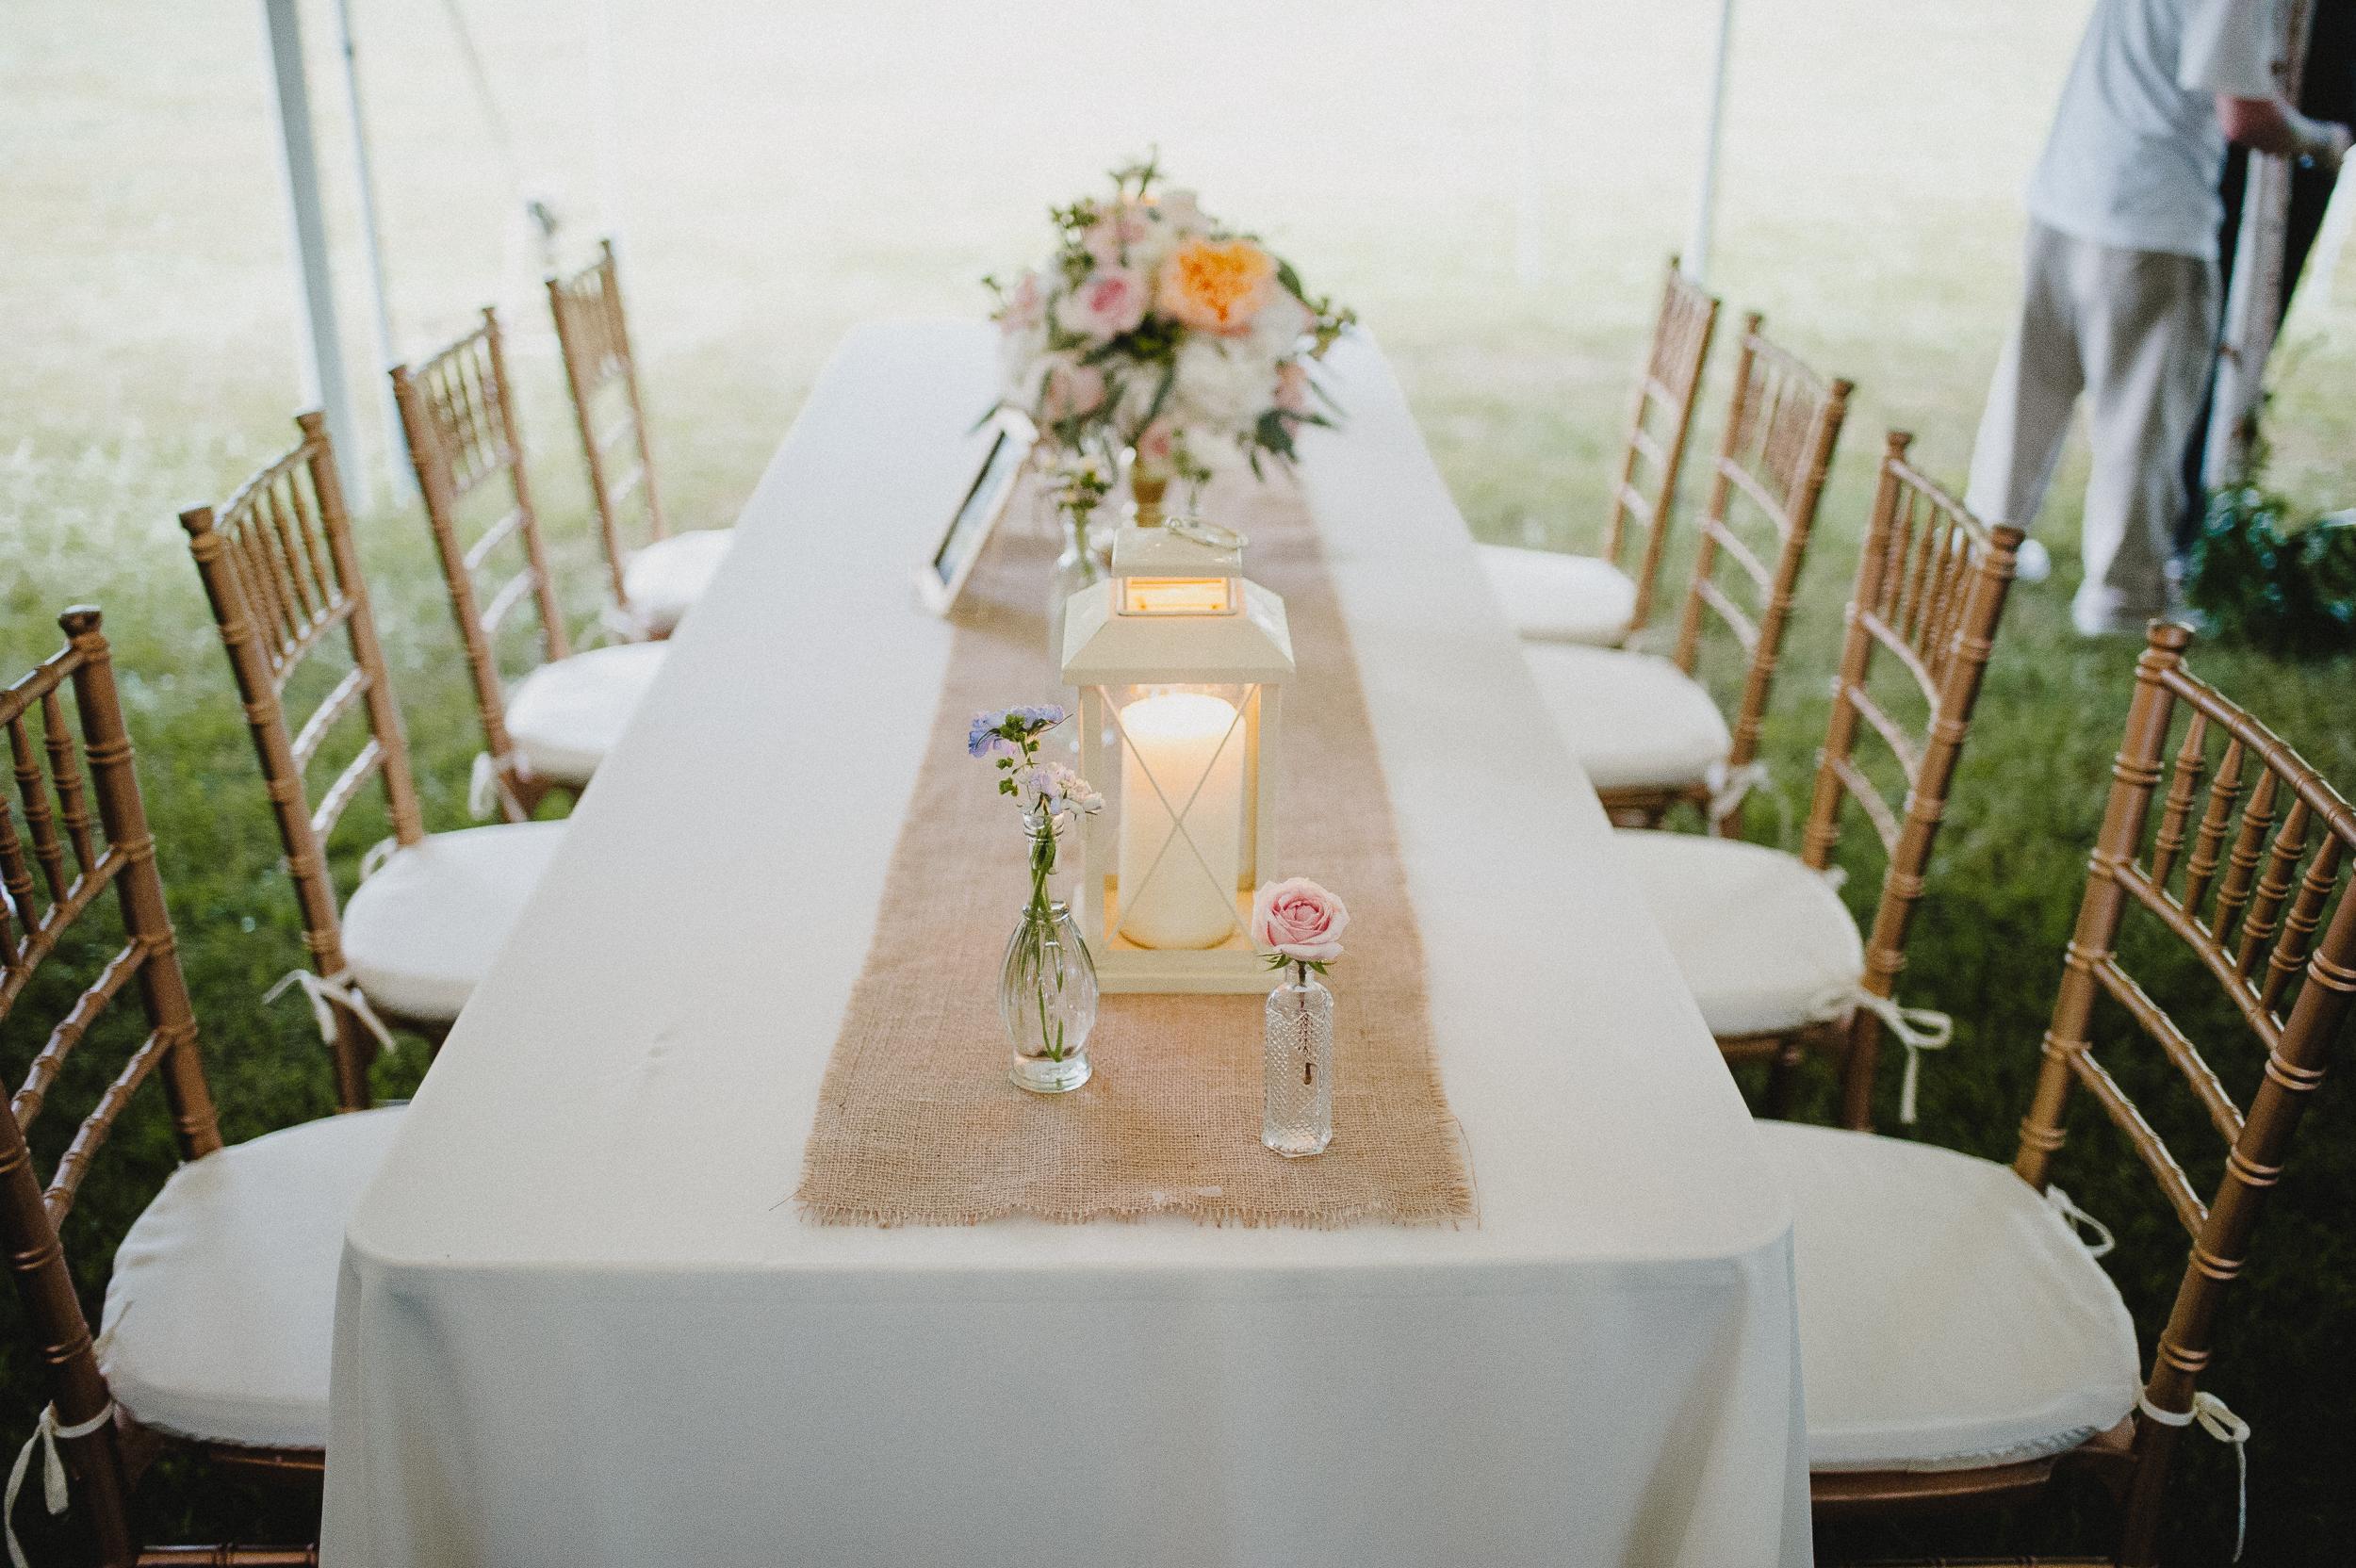 delaware-estate-wedding-photographer-pat-robinson-photography-75.jpg